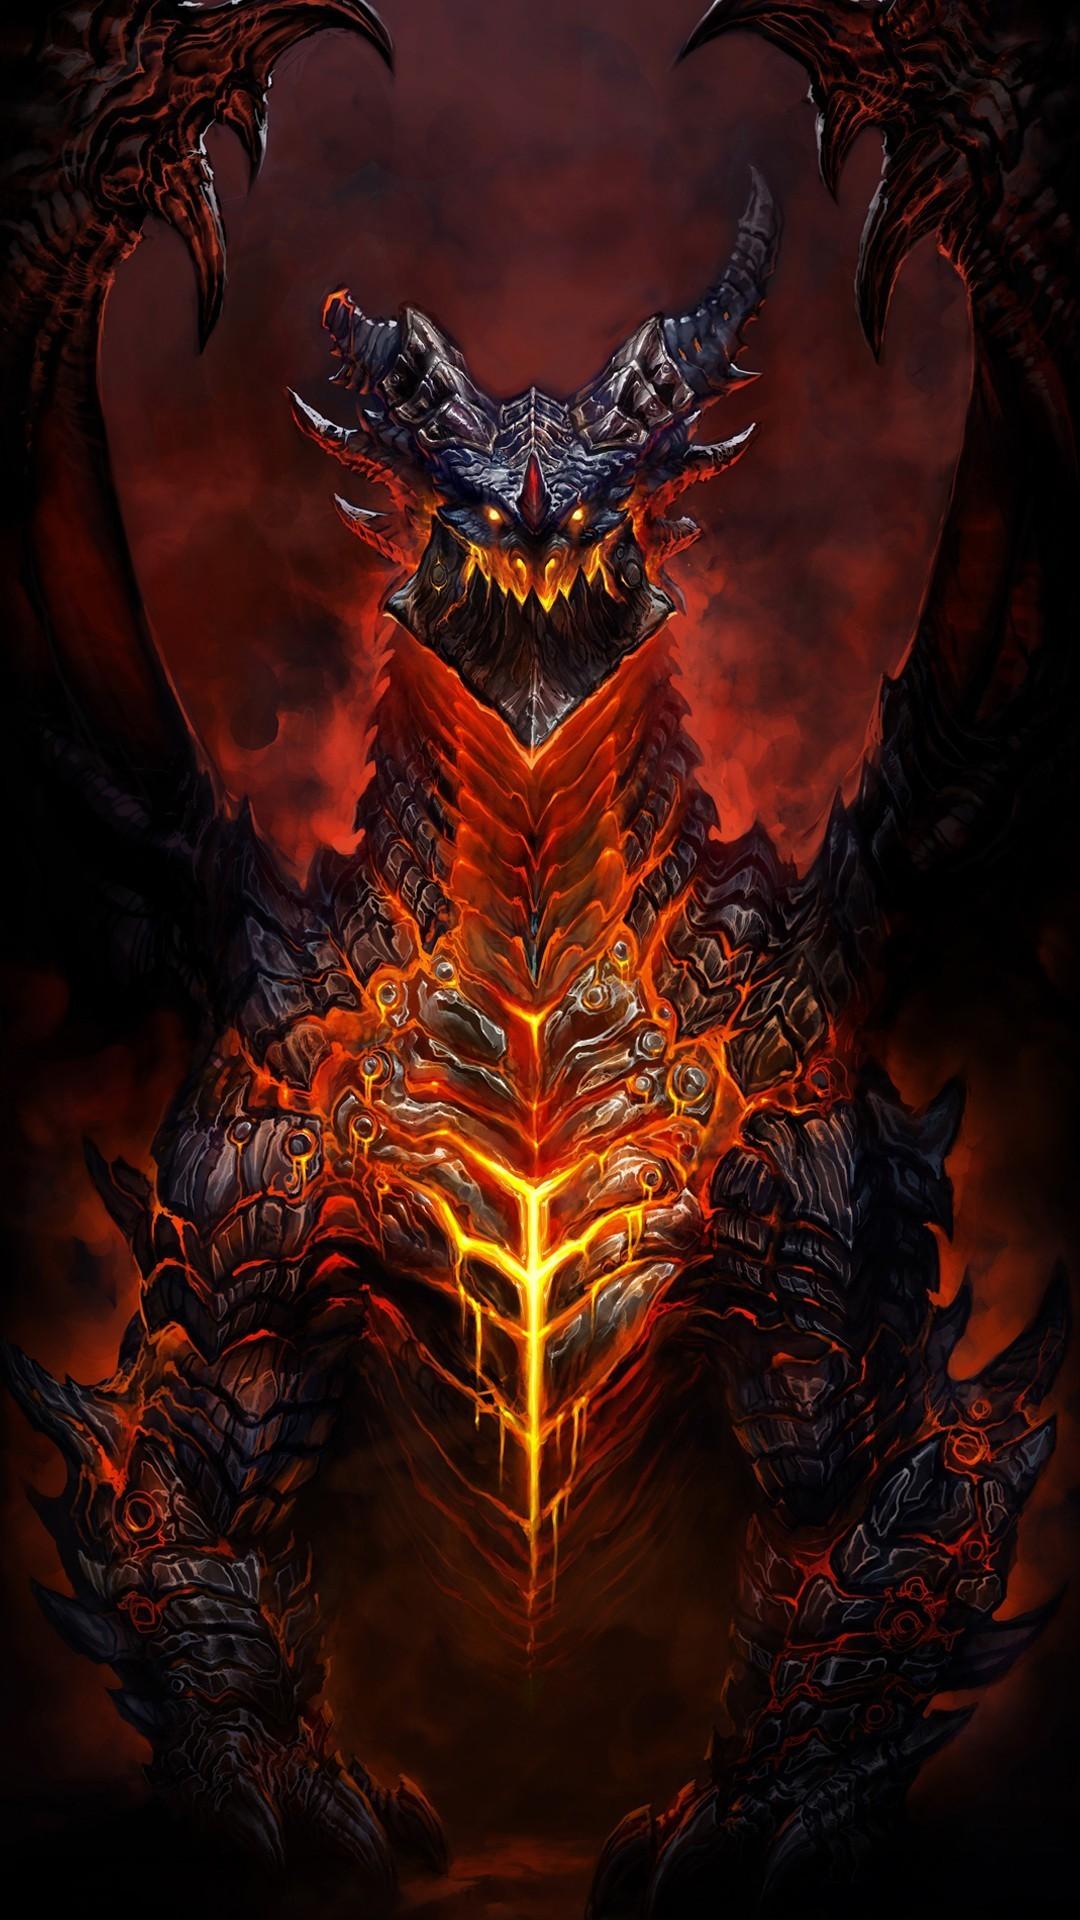 Deathwing world warcraft htc one wallpaper